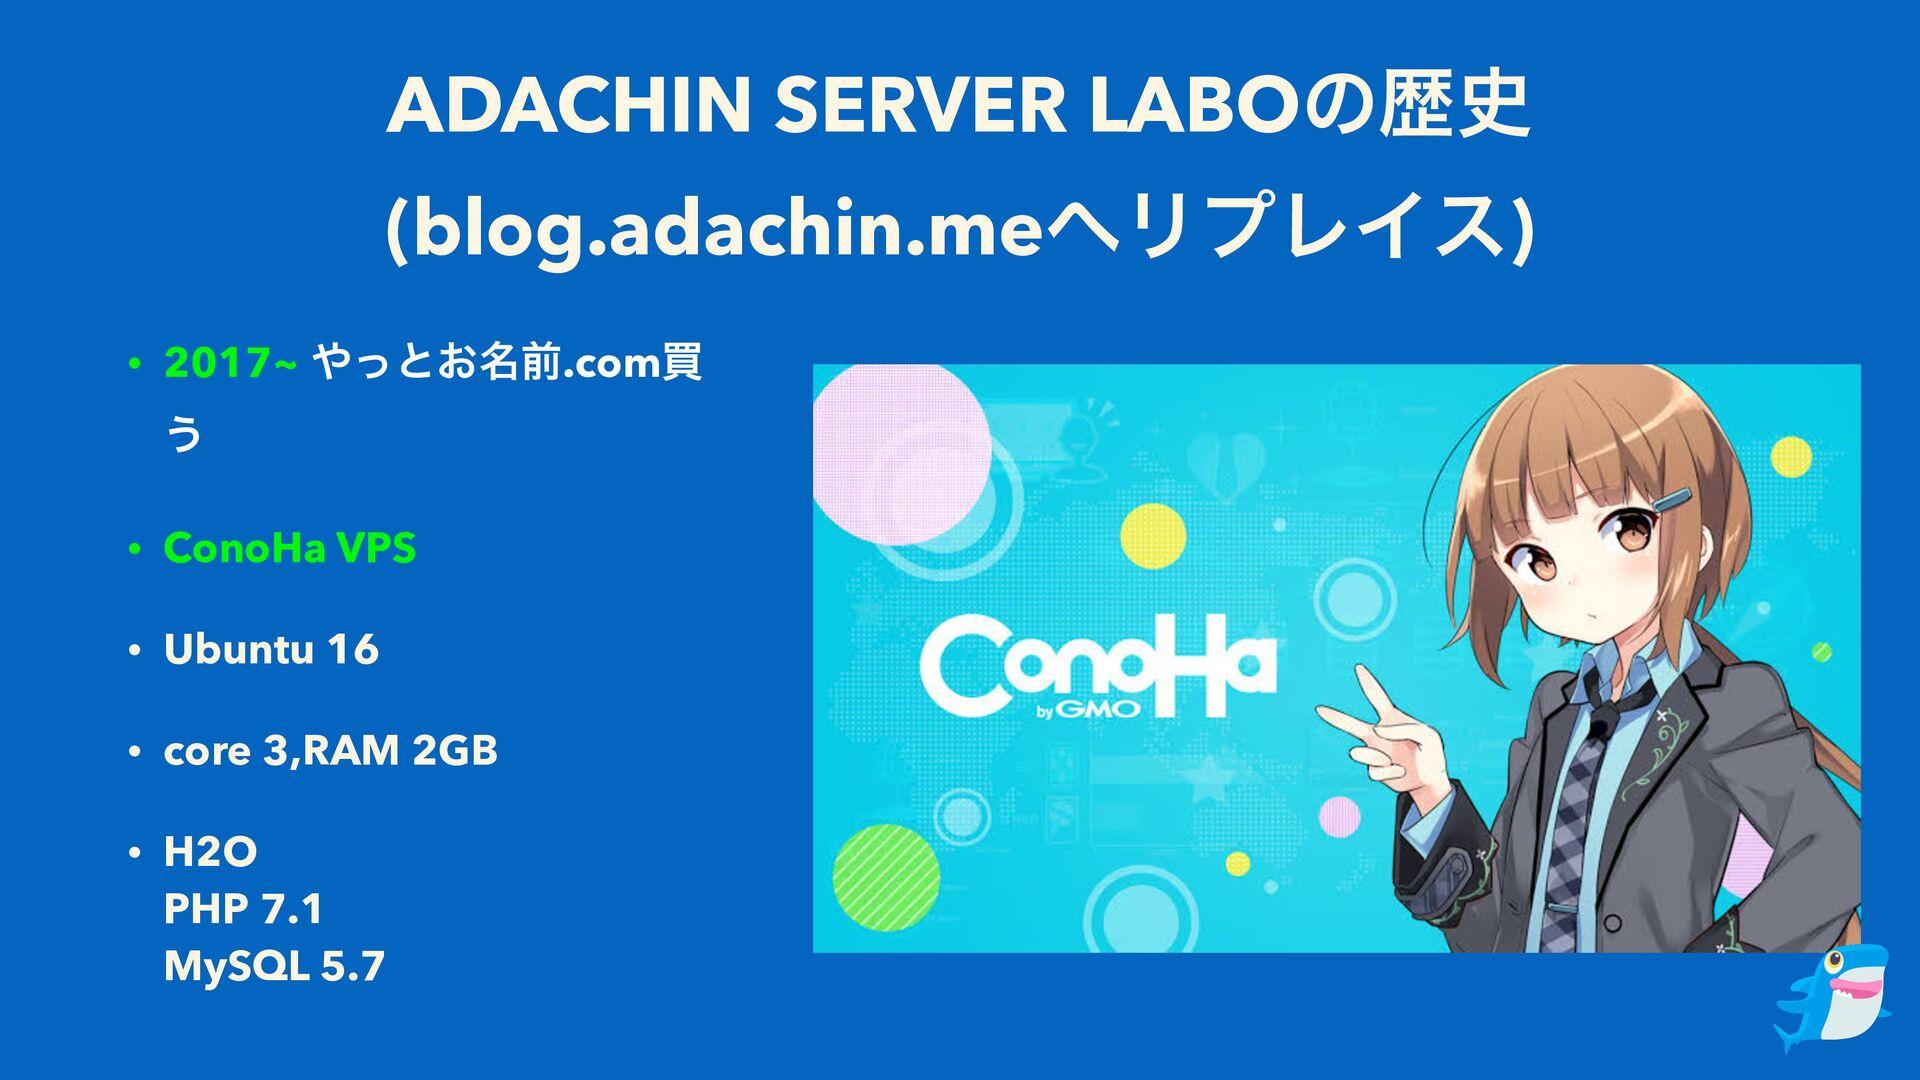 ADACHIN SERVER LABOͷྺ (blog.adachin.meϦϓϨΠε) ...